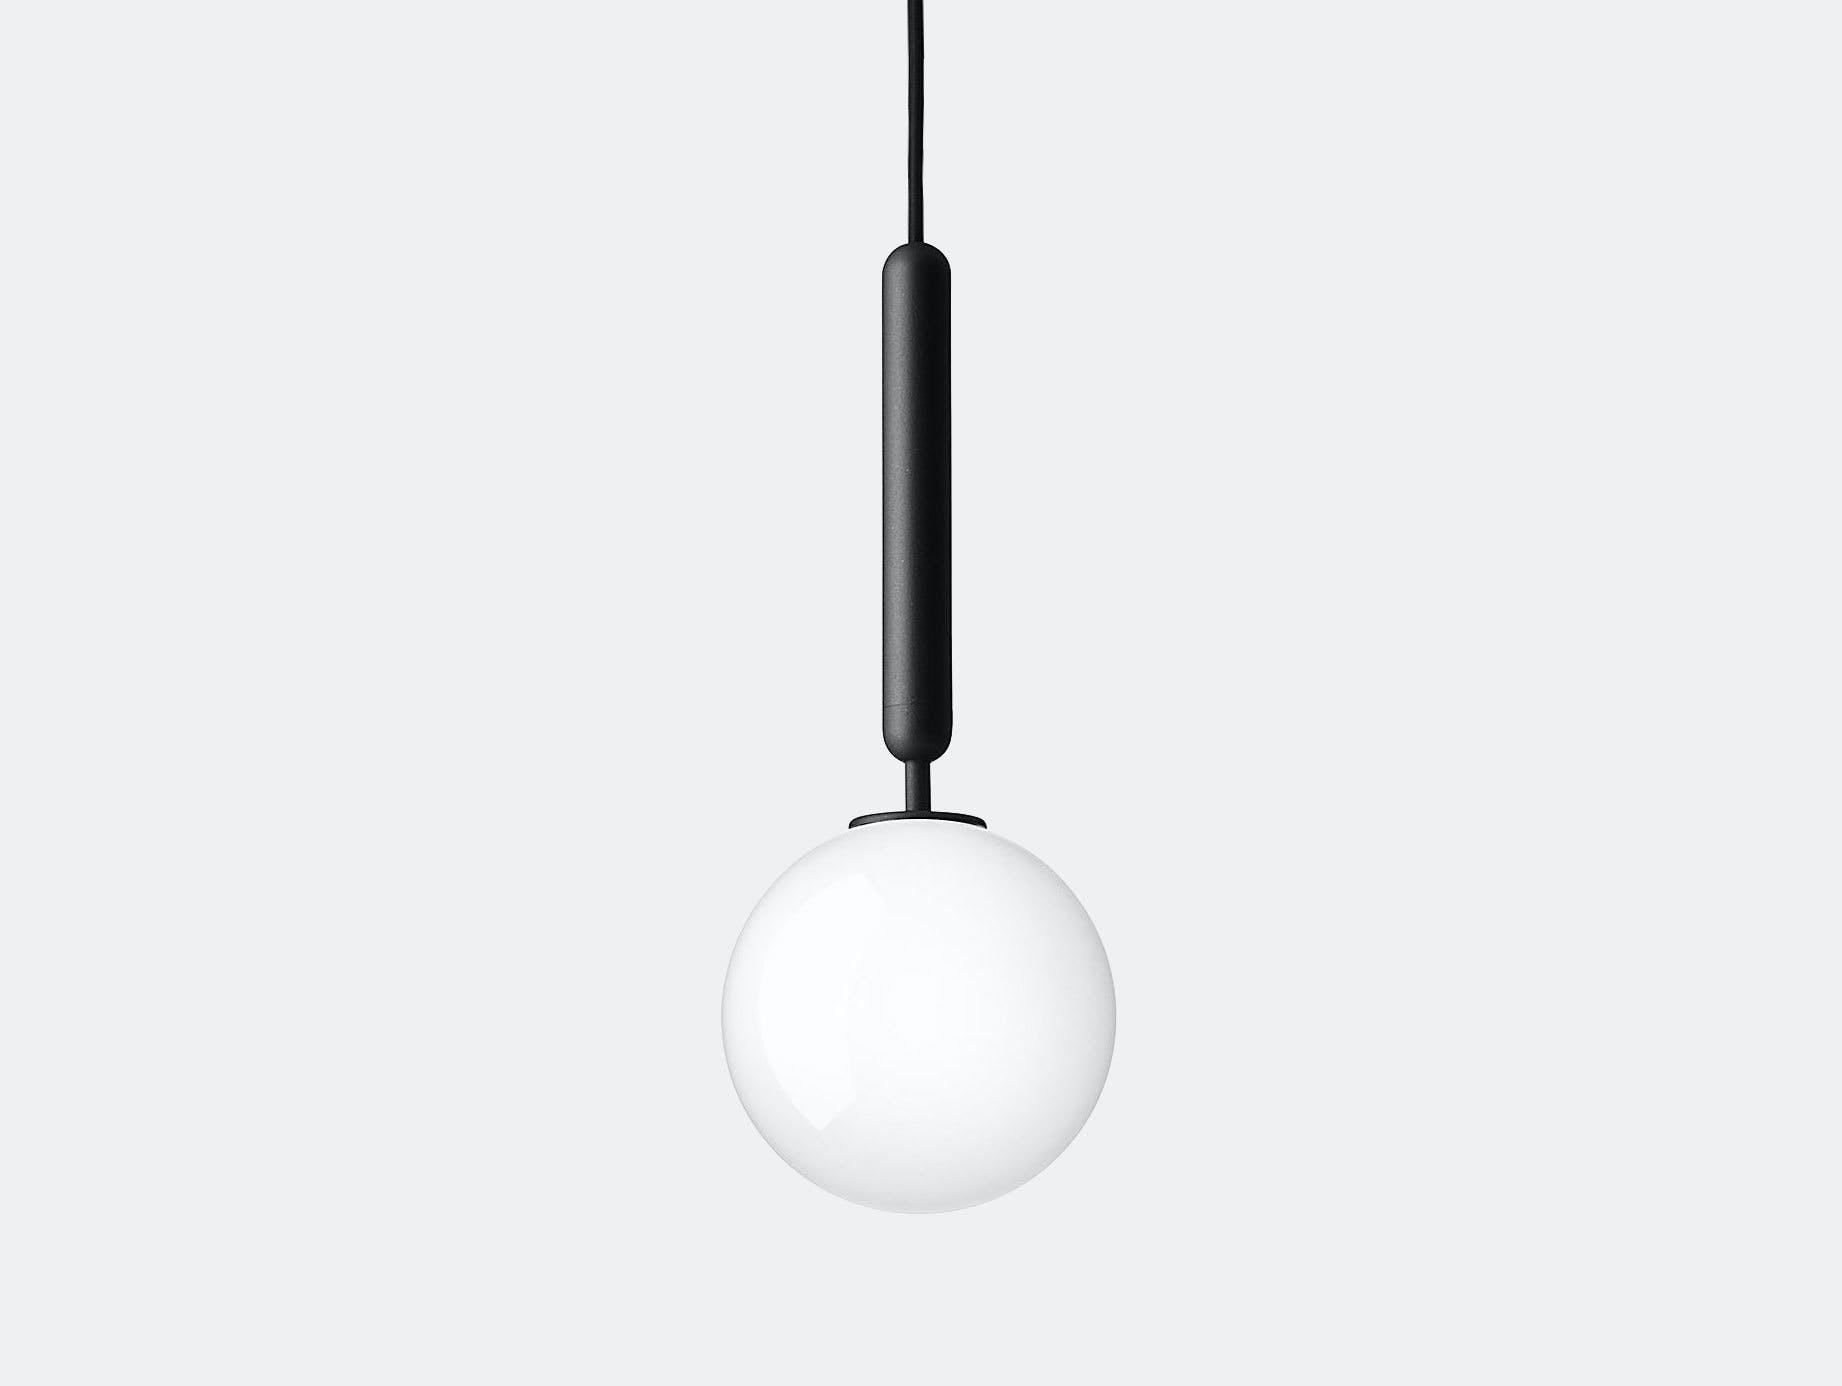 Nuura Miira 1 Pendant Light Opal Sofie Refer